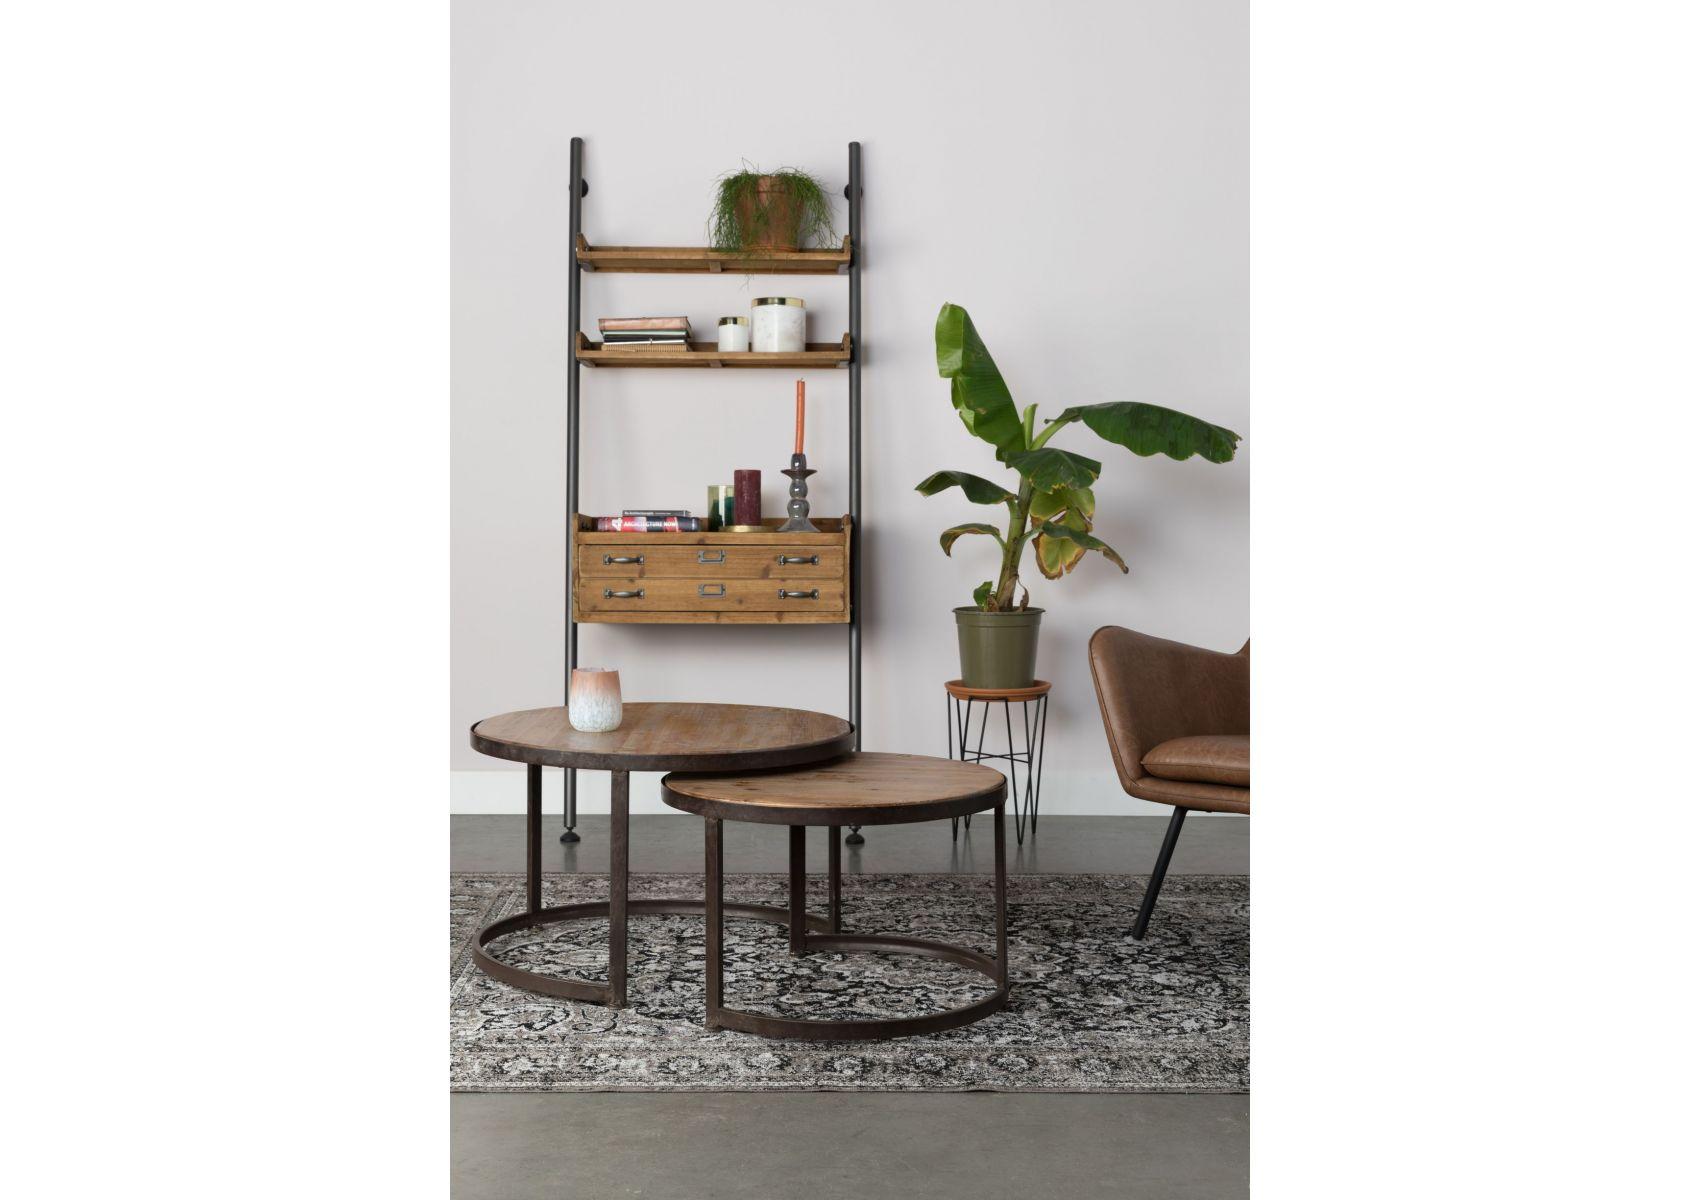 Table basse ronde gigogne metal Table basse ronde bois et metal